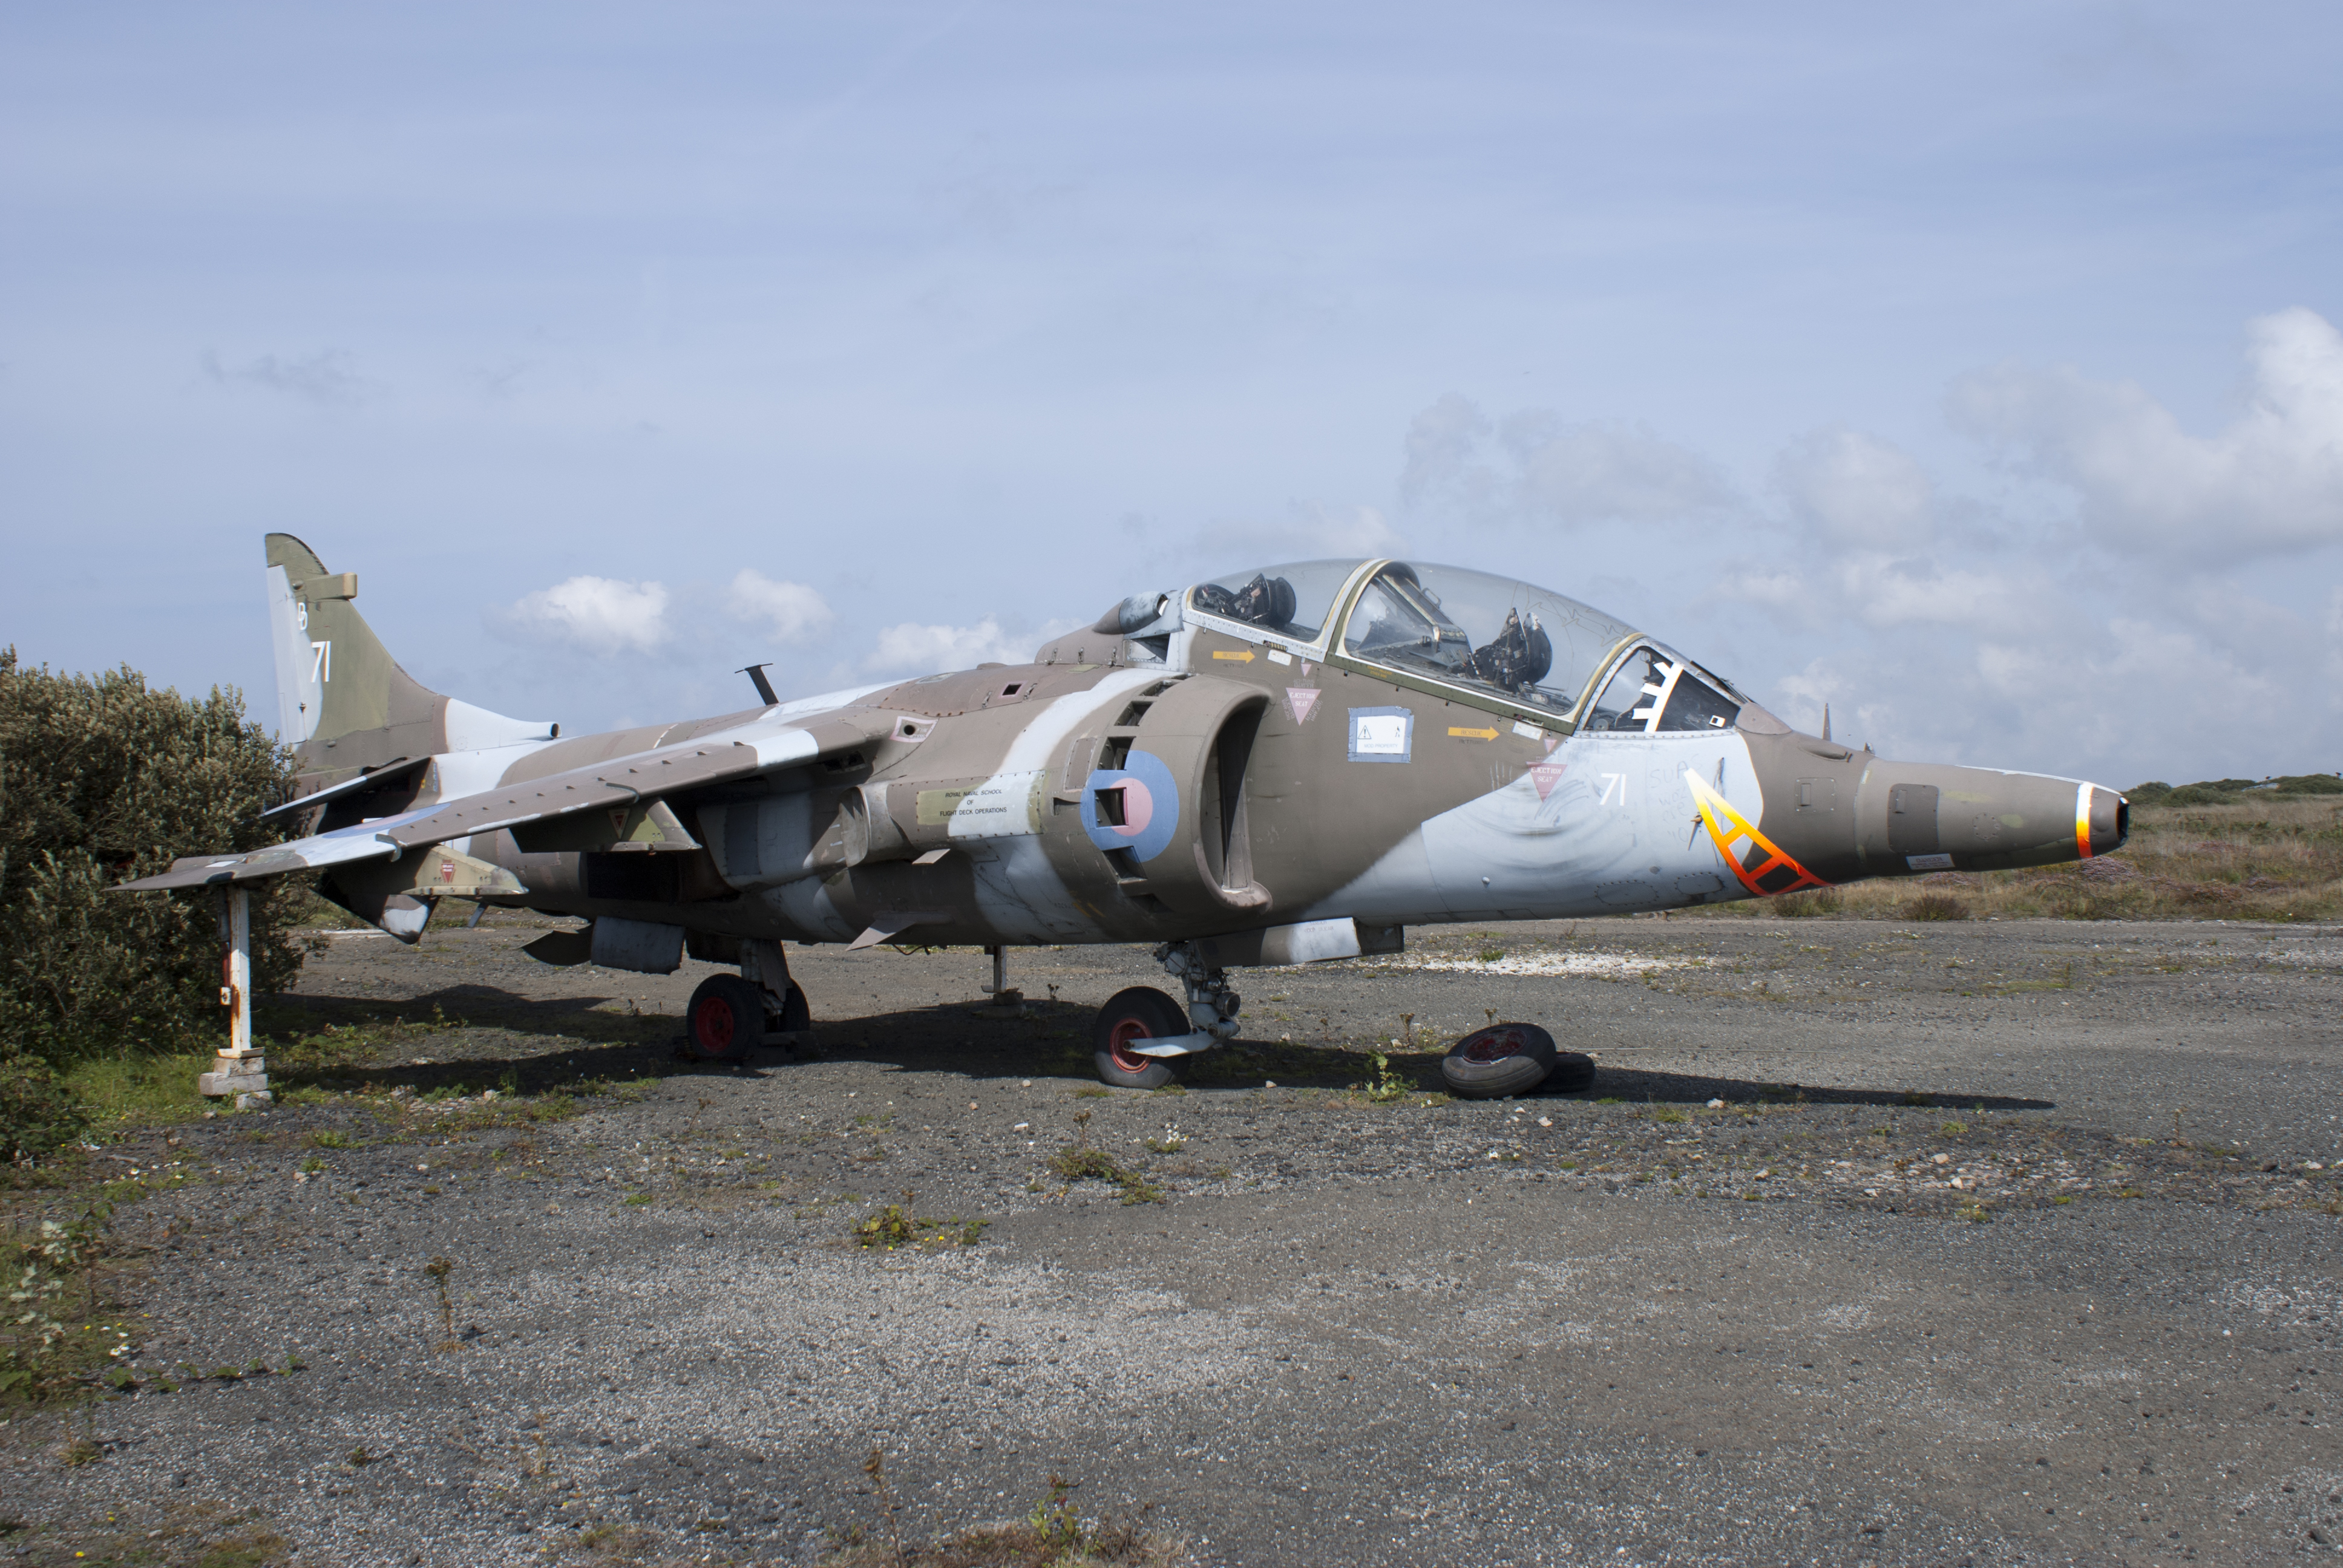 Hawker Siddeley Harrier T4a Xw271 Aeroresource Engine Diagram